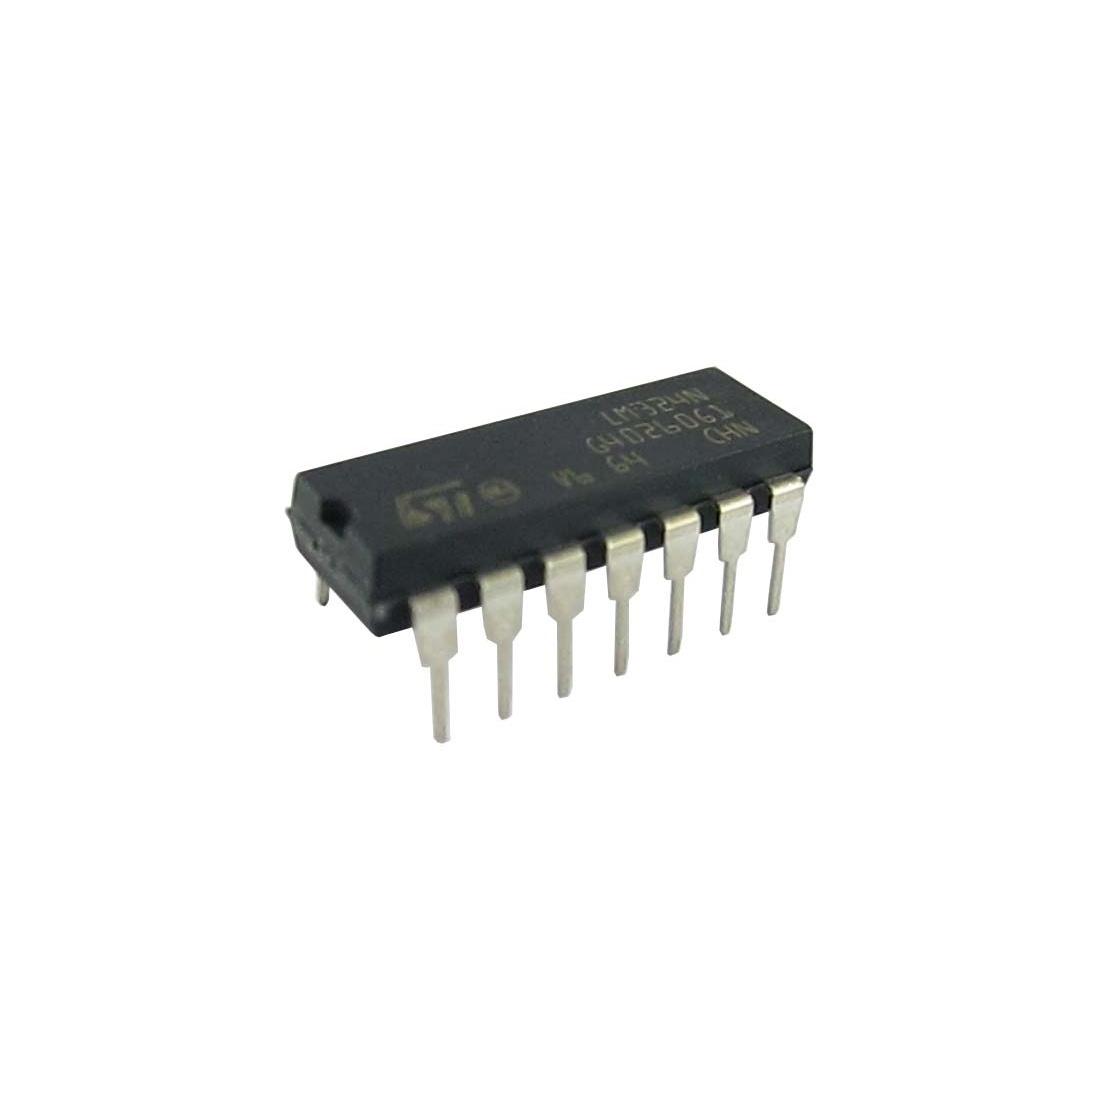 lm324 quad op amp rh shop edwinrobotics com lm324 quad operational amplifier lm324 quad op amp datasheet